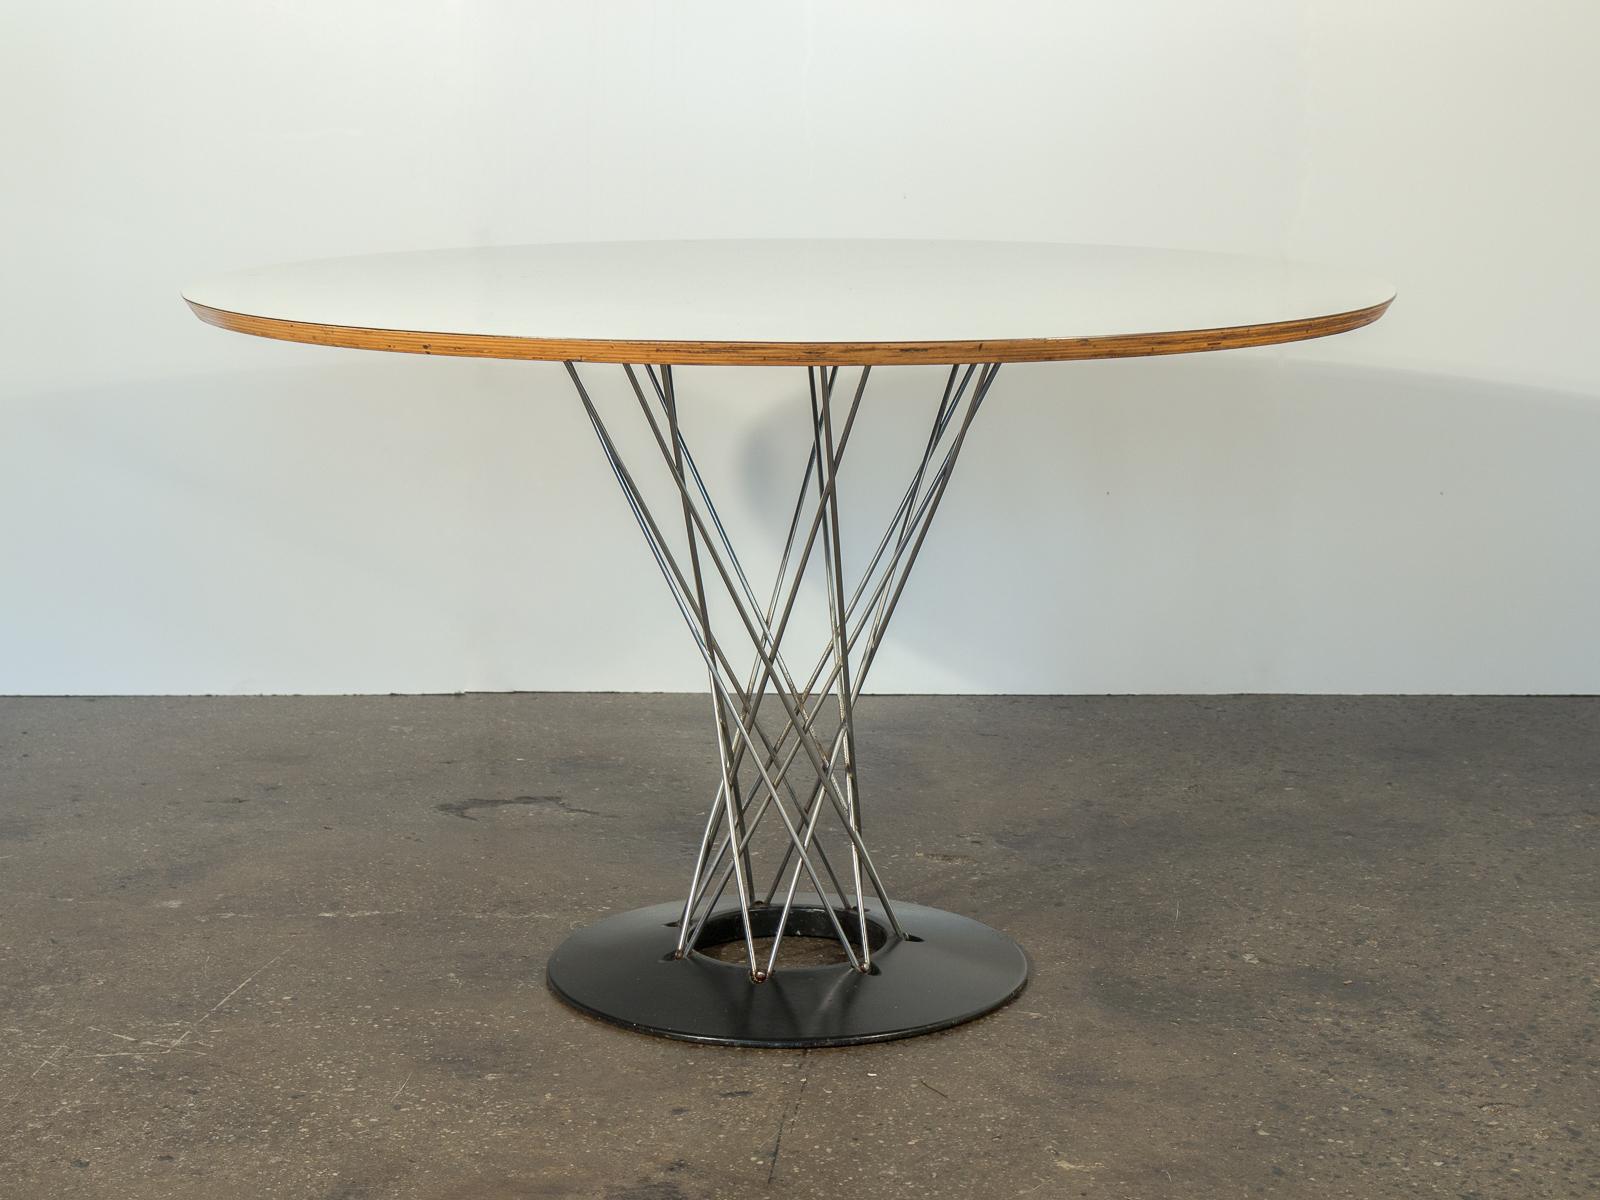 Knoll Cyclone Table by Isamu Noguchi